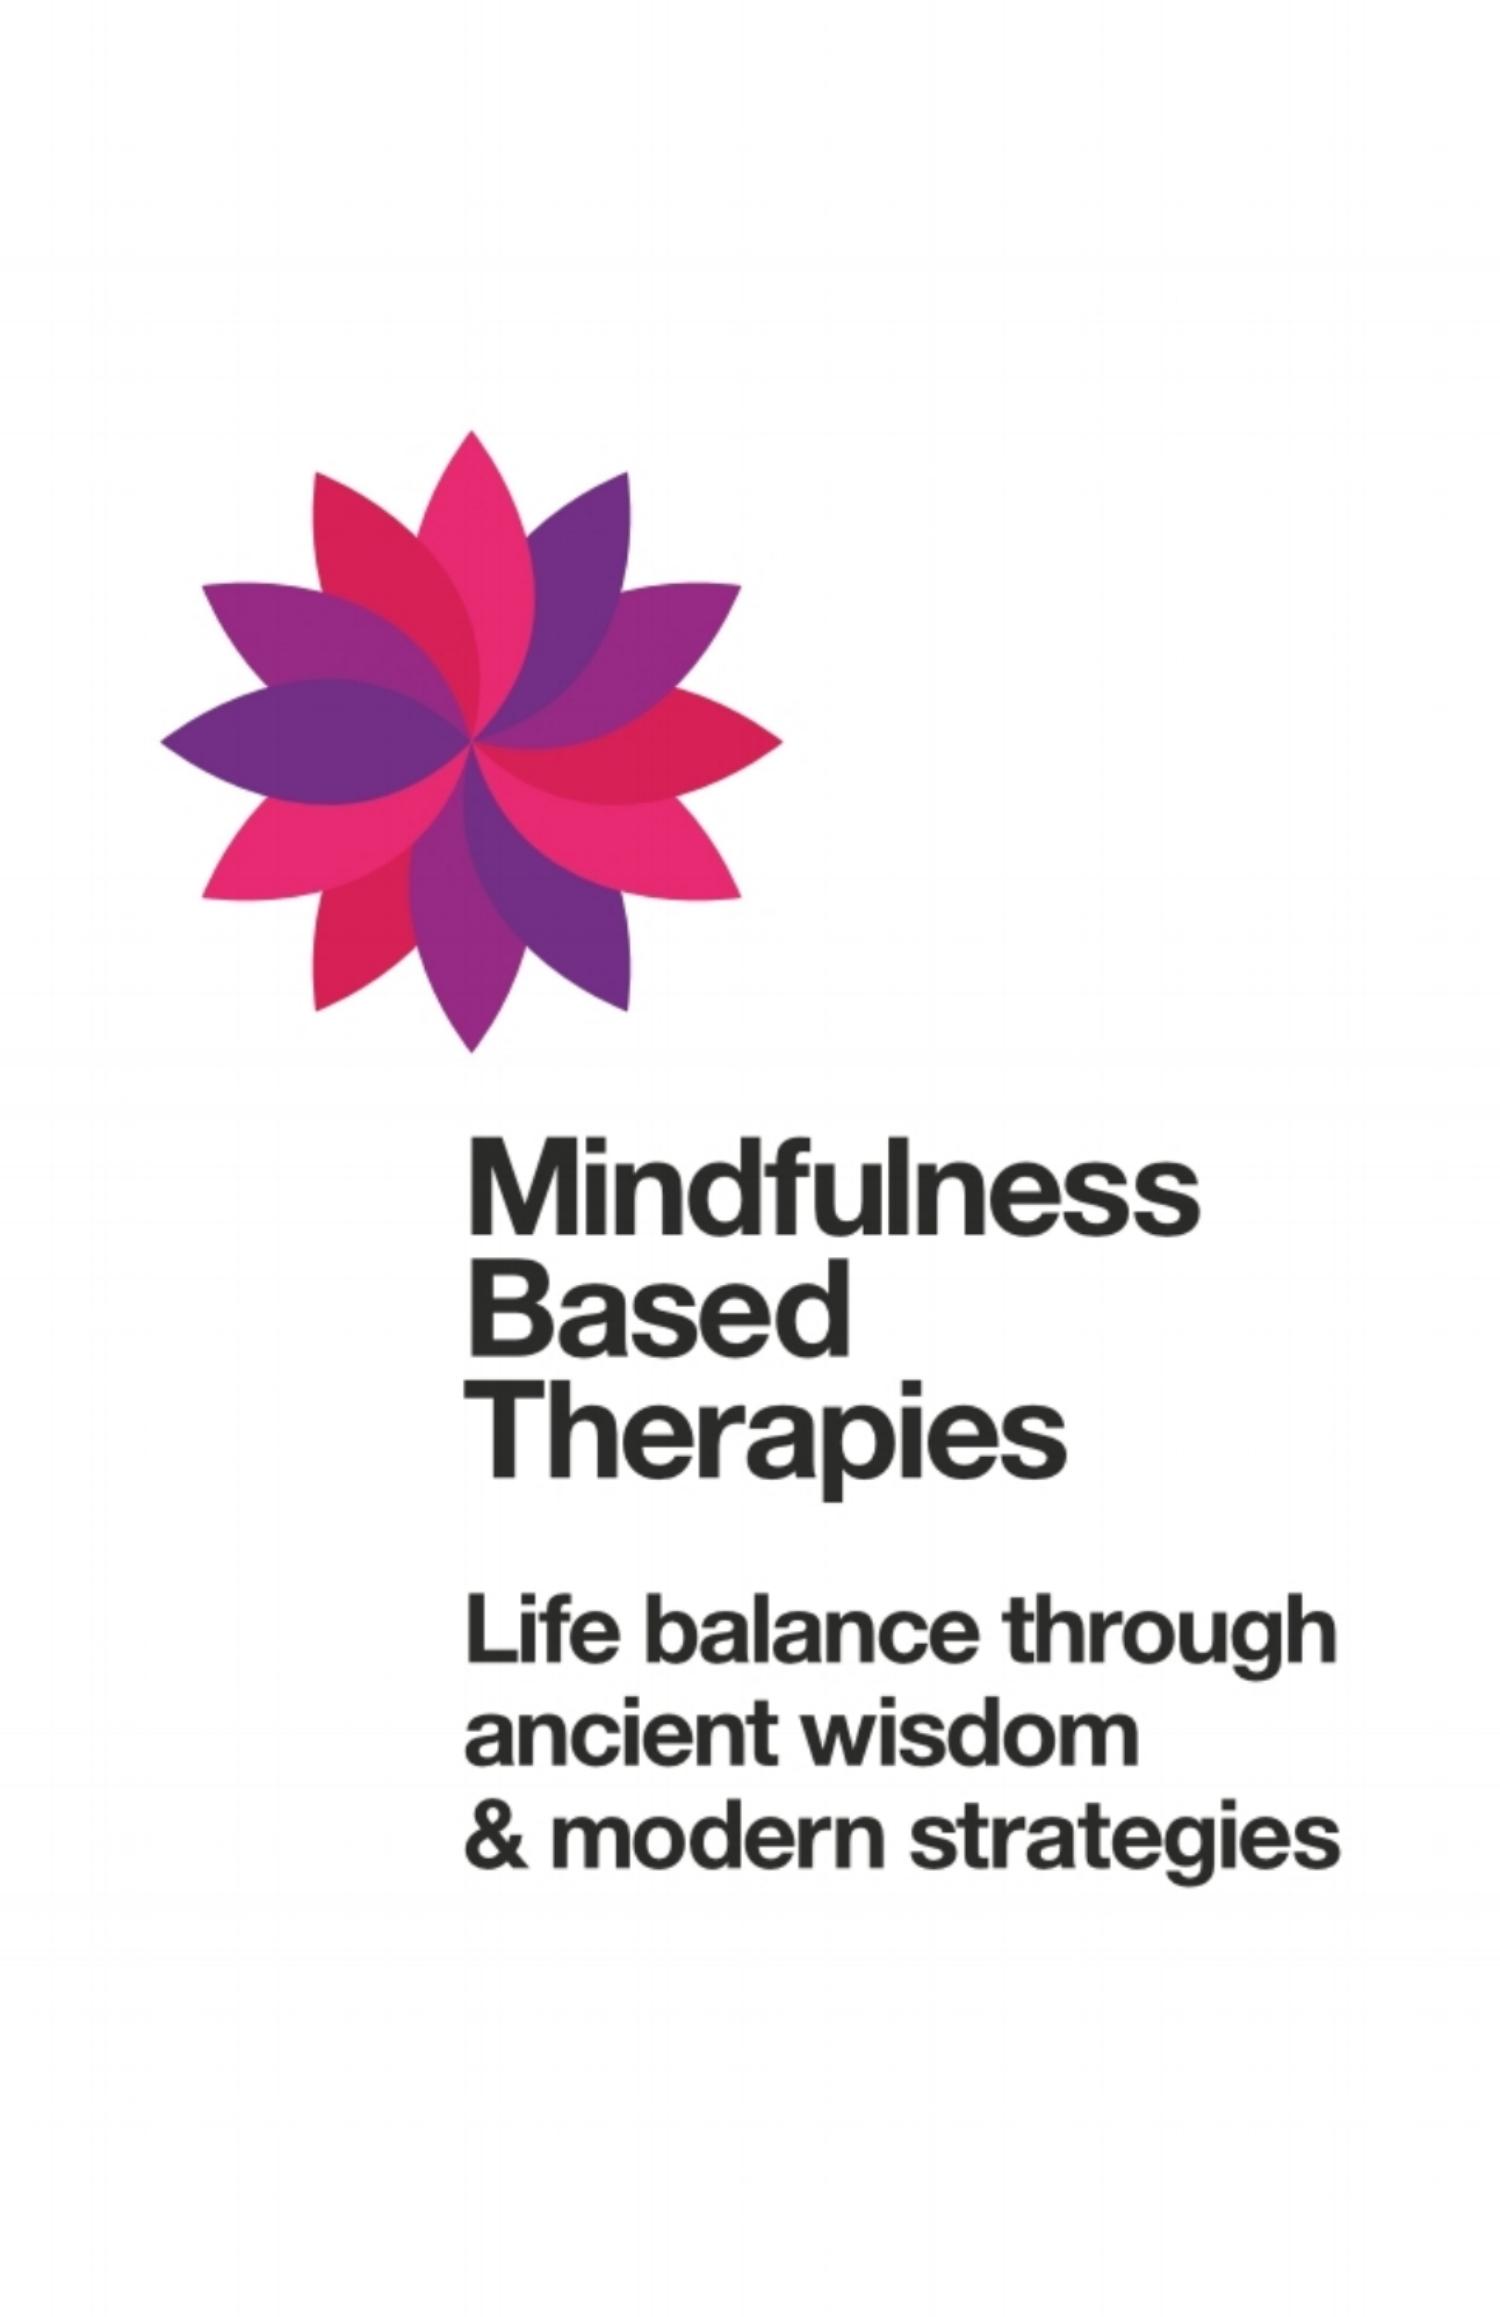 lifebalanceancienywisdommodernstratogies.jpg